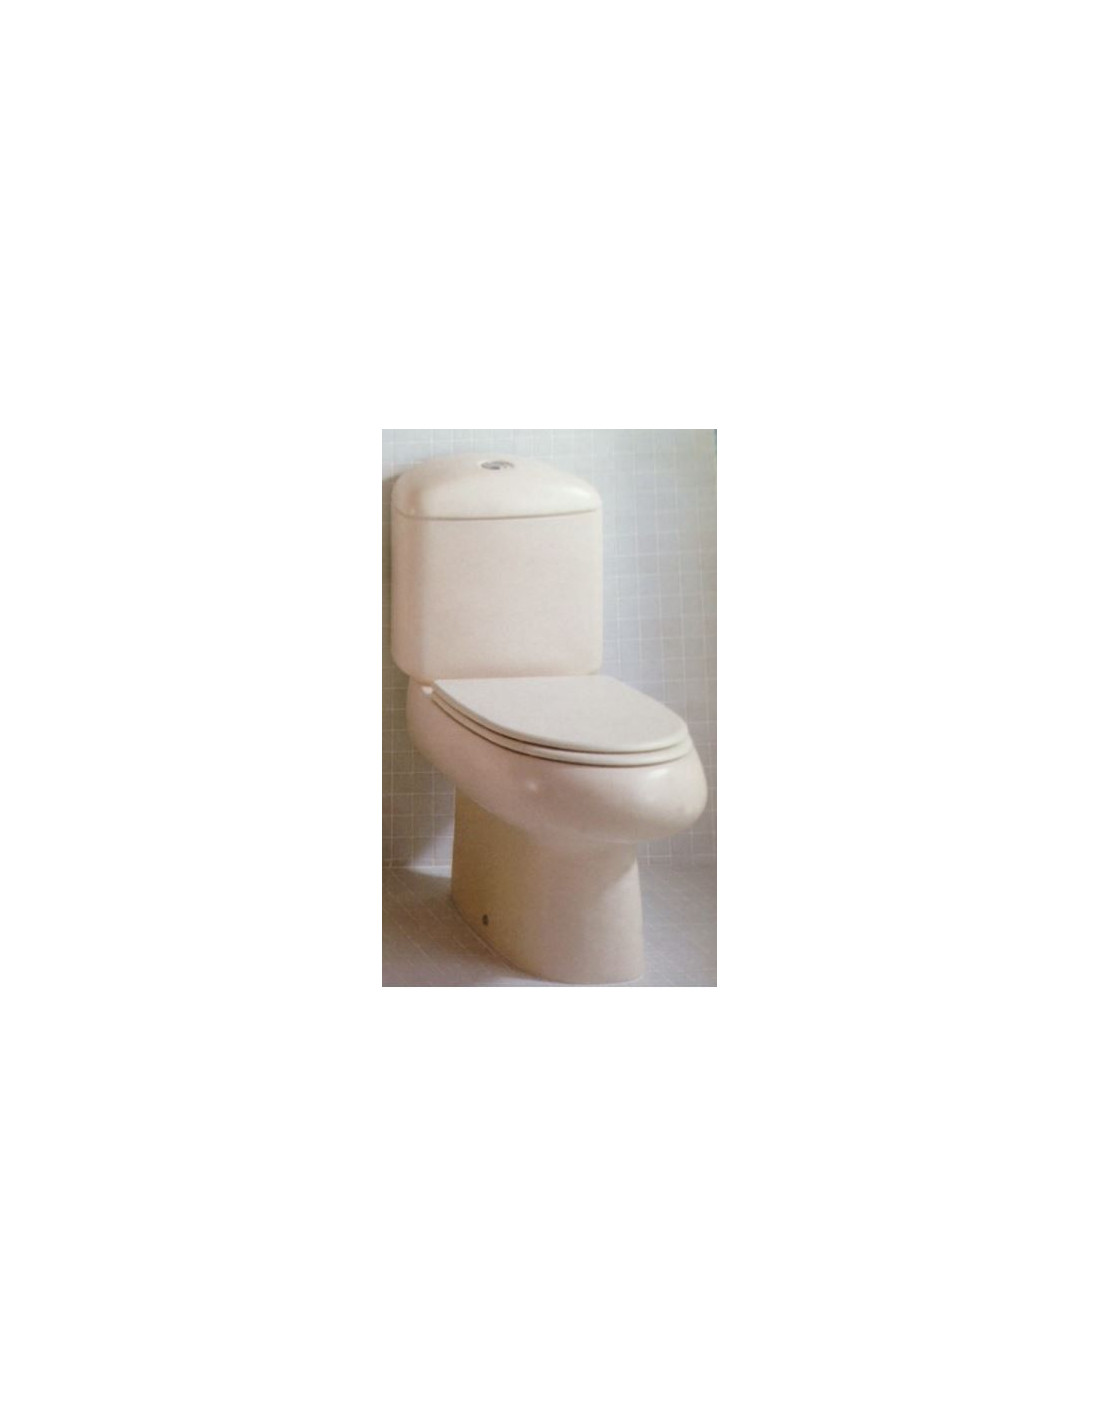 Tapa wc gala loa best latest simple asiento tapa wc gala - Tapa inodoro gala ...